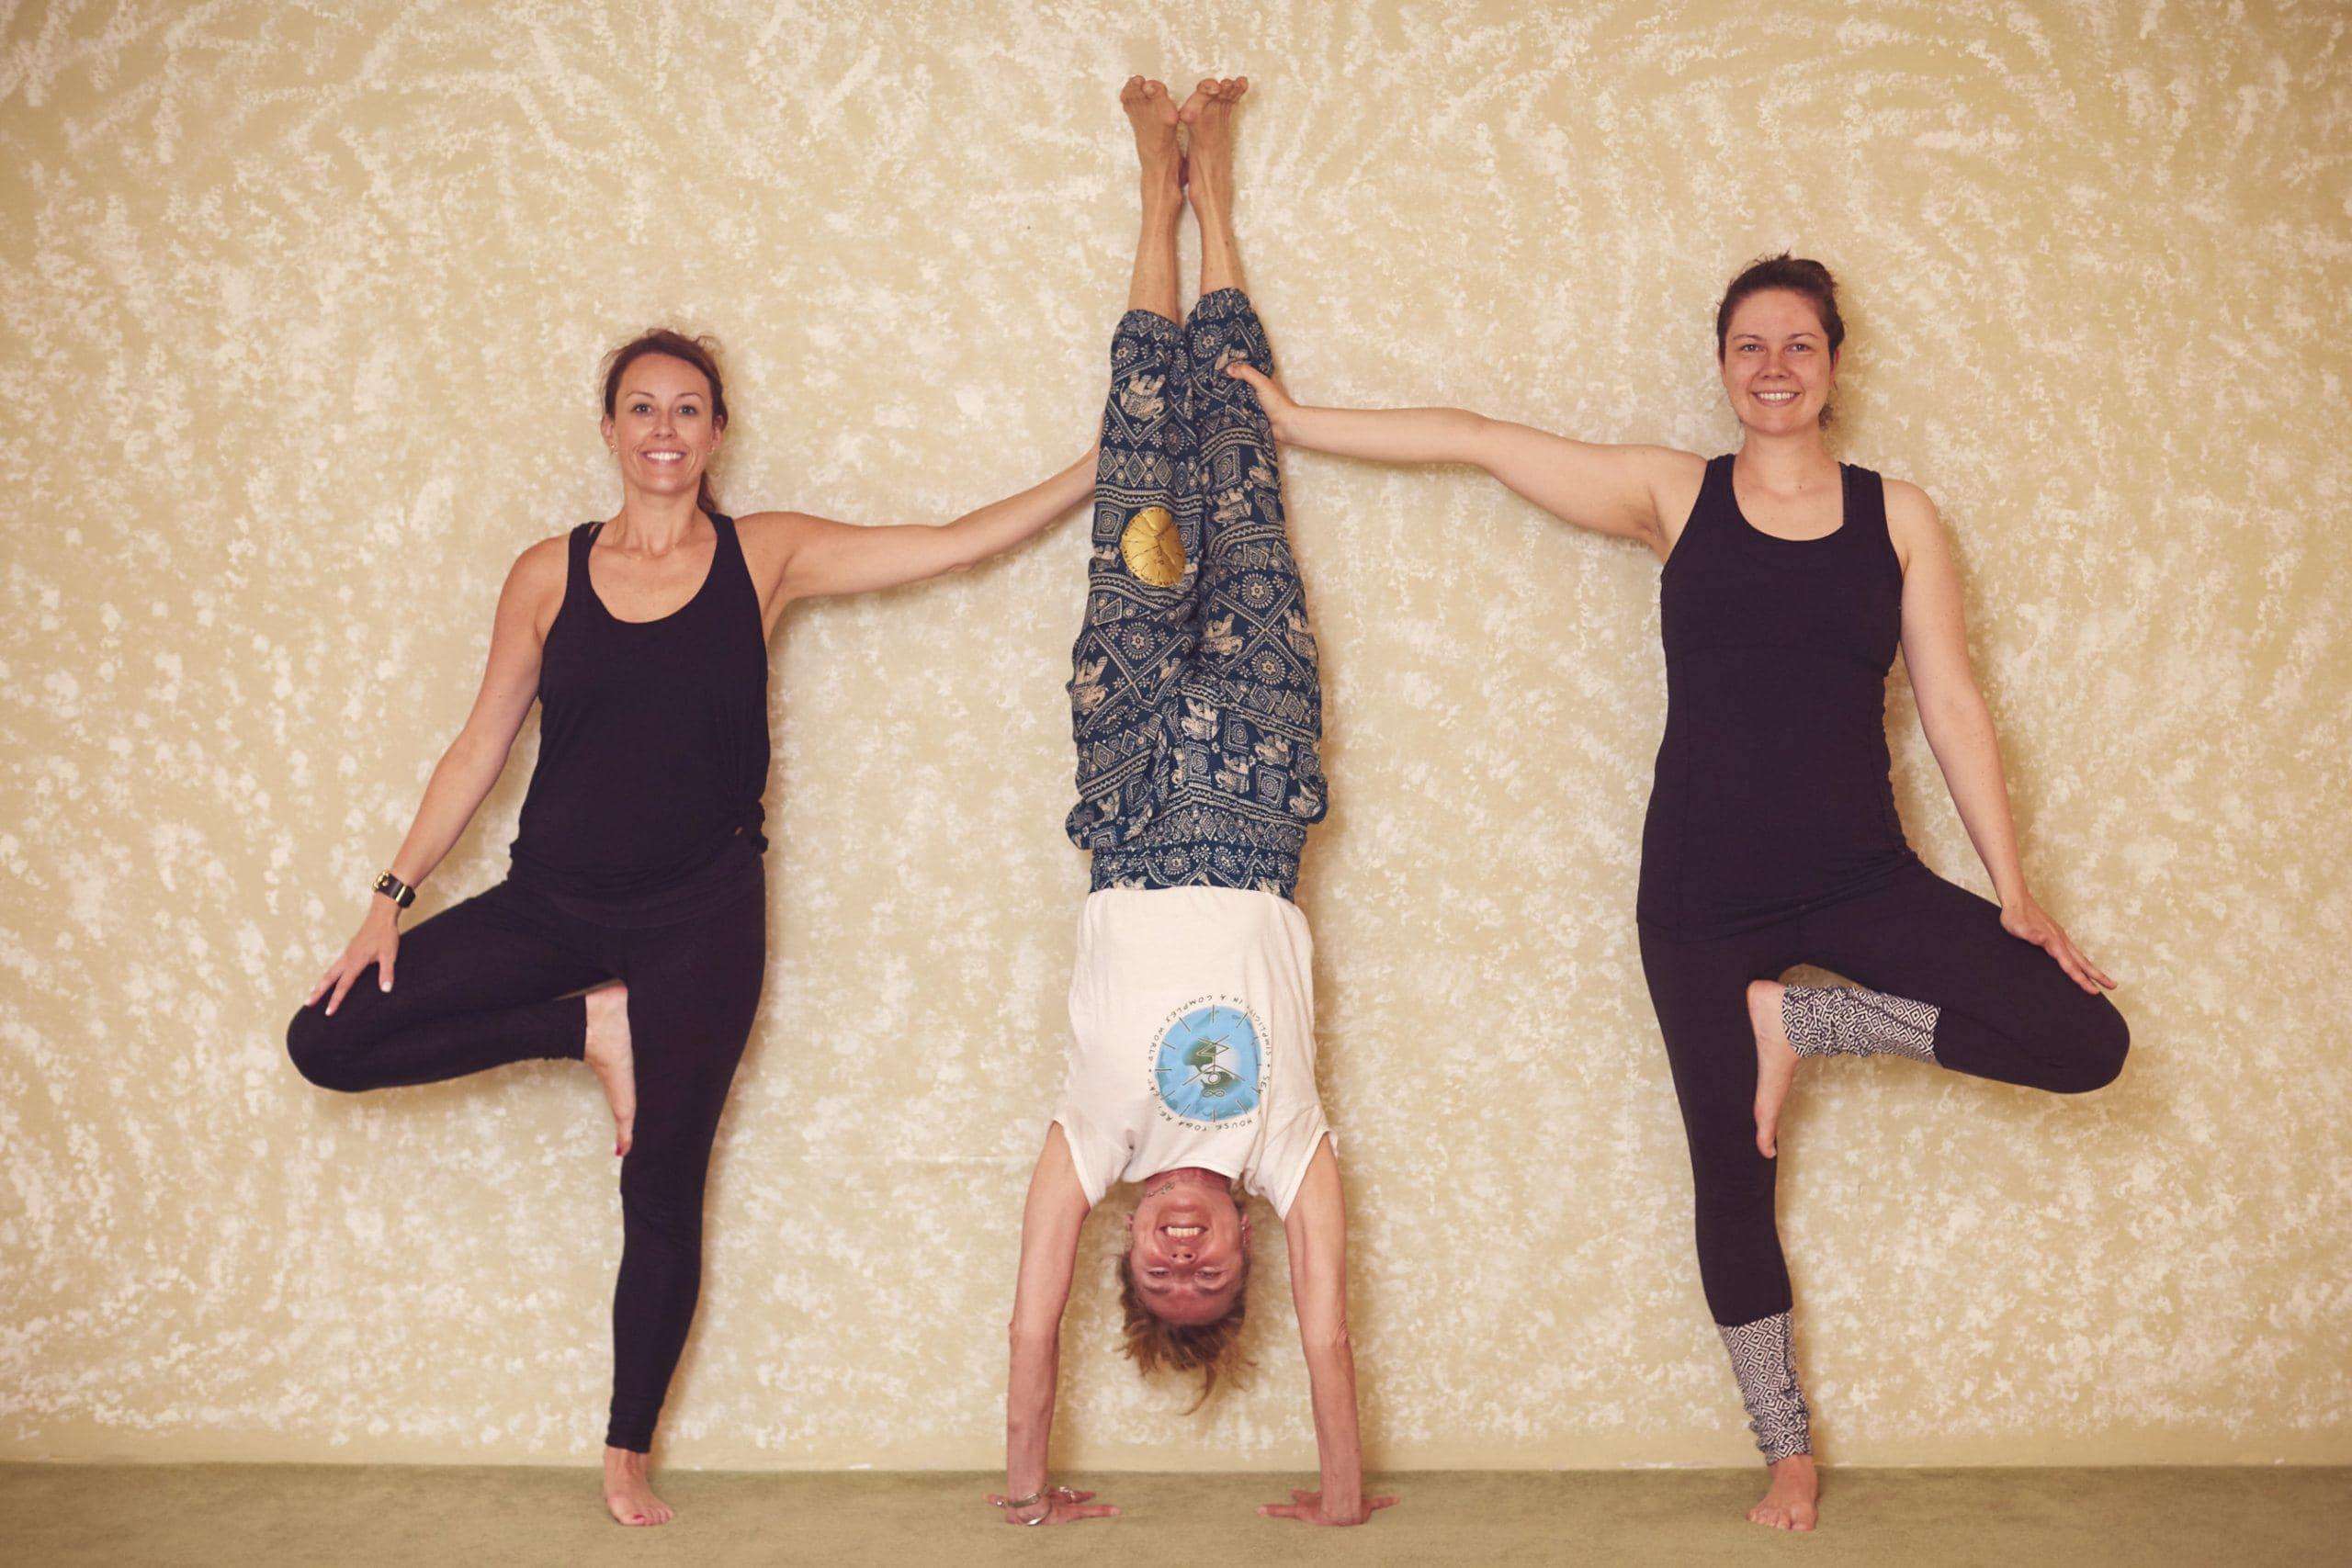 Teacher Training 200 Hour Yoga Alliance June To July Sewall House Yoga Retreat